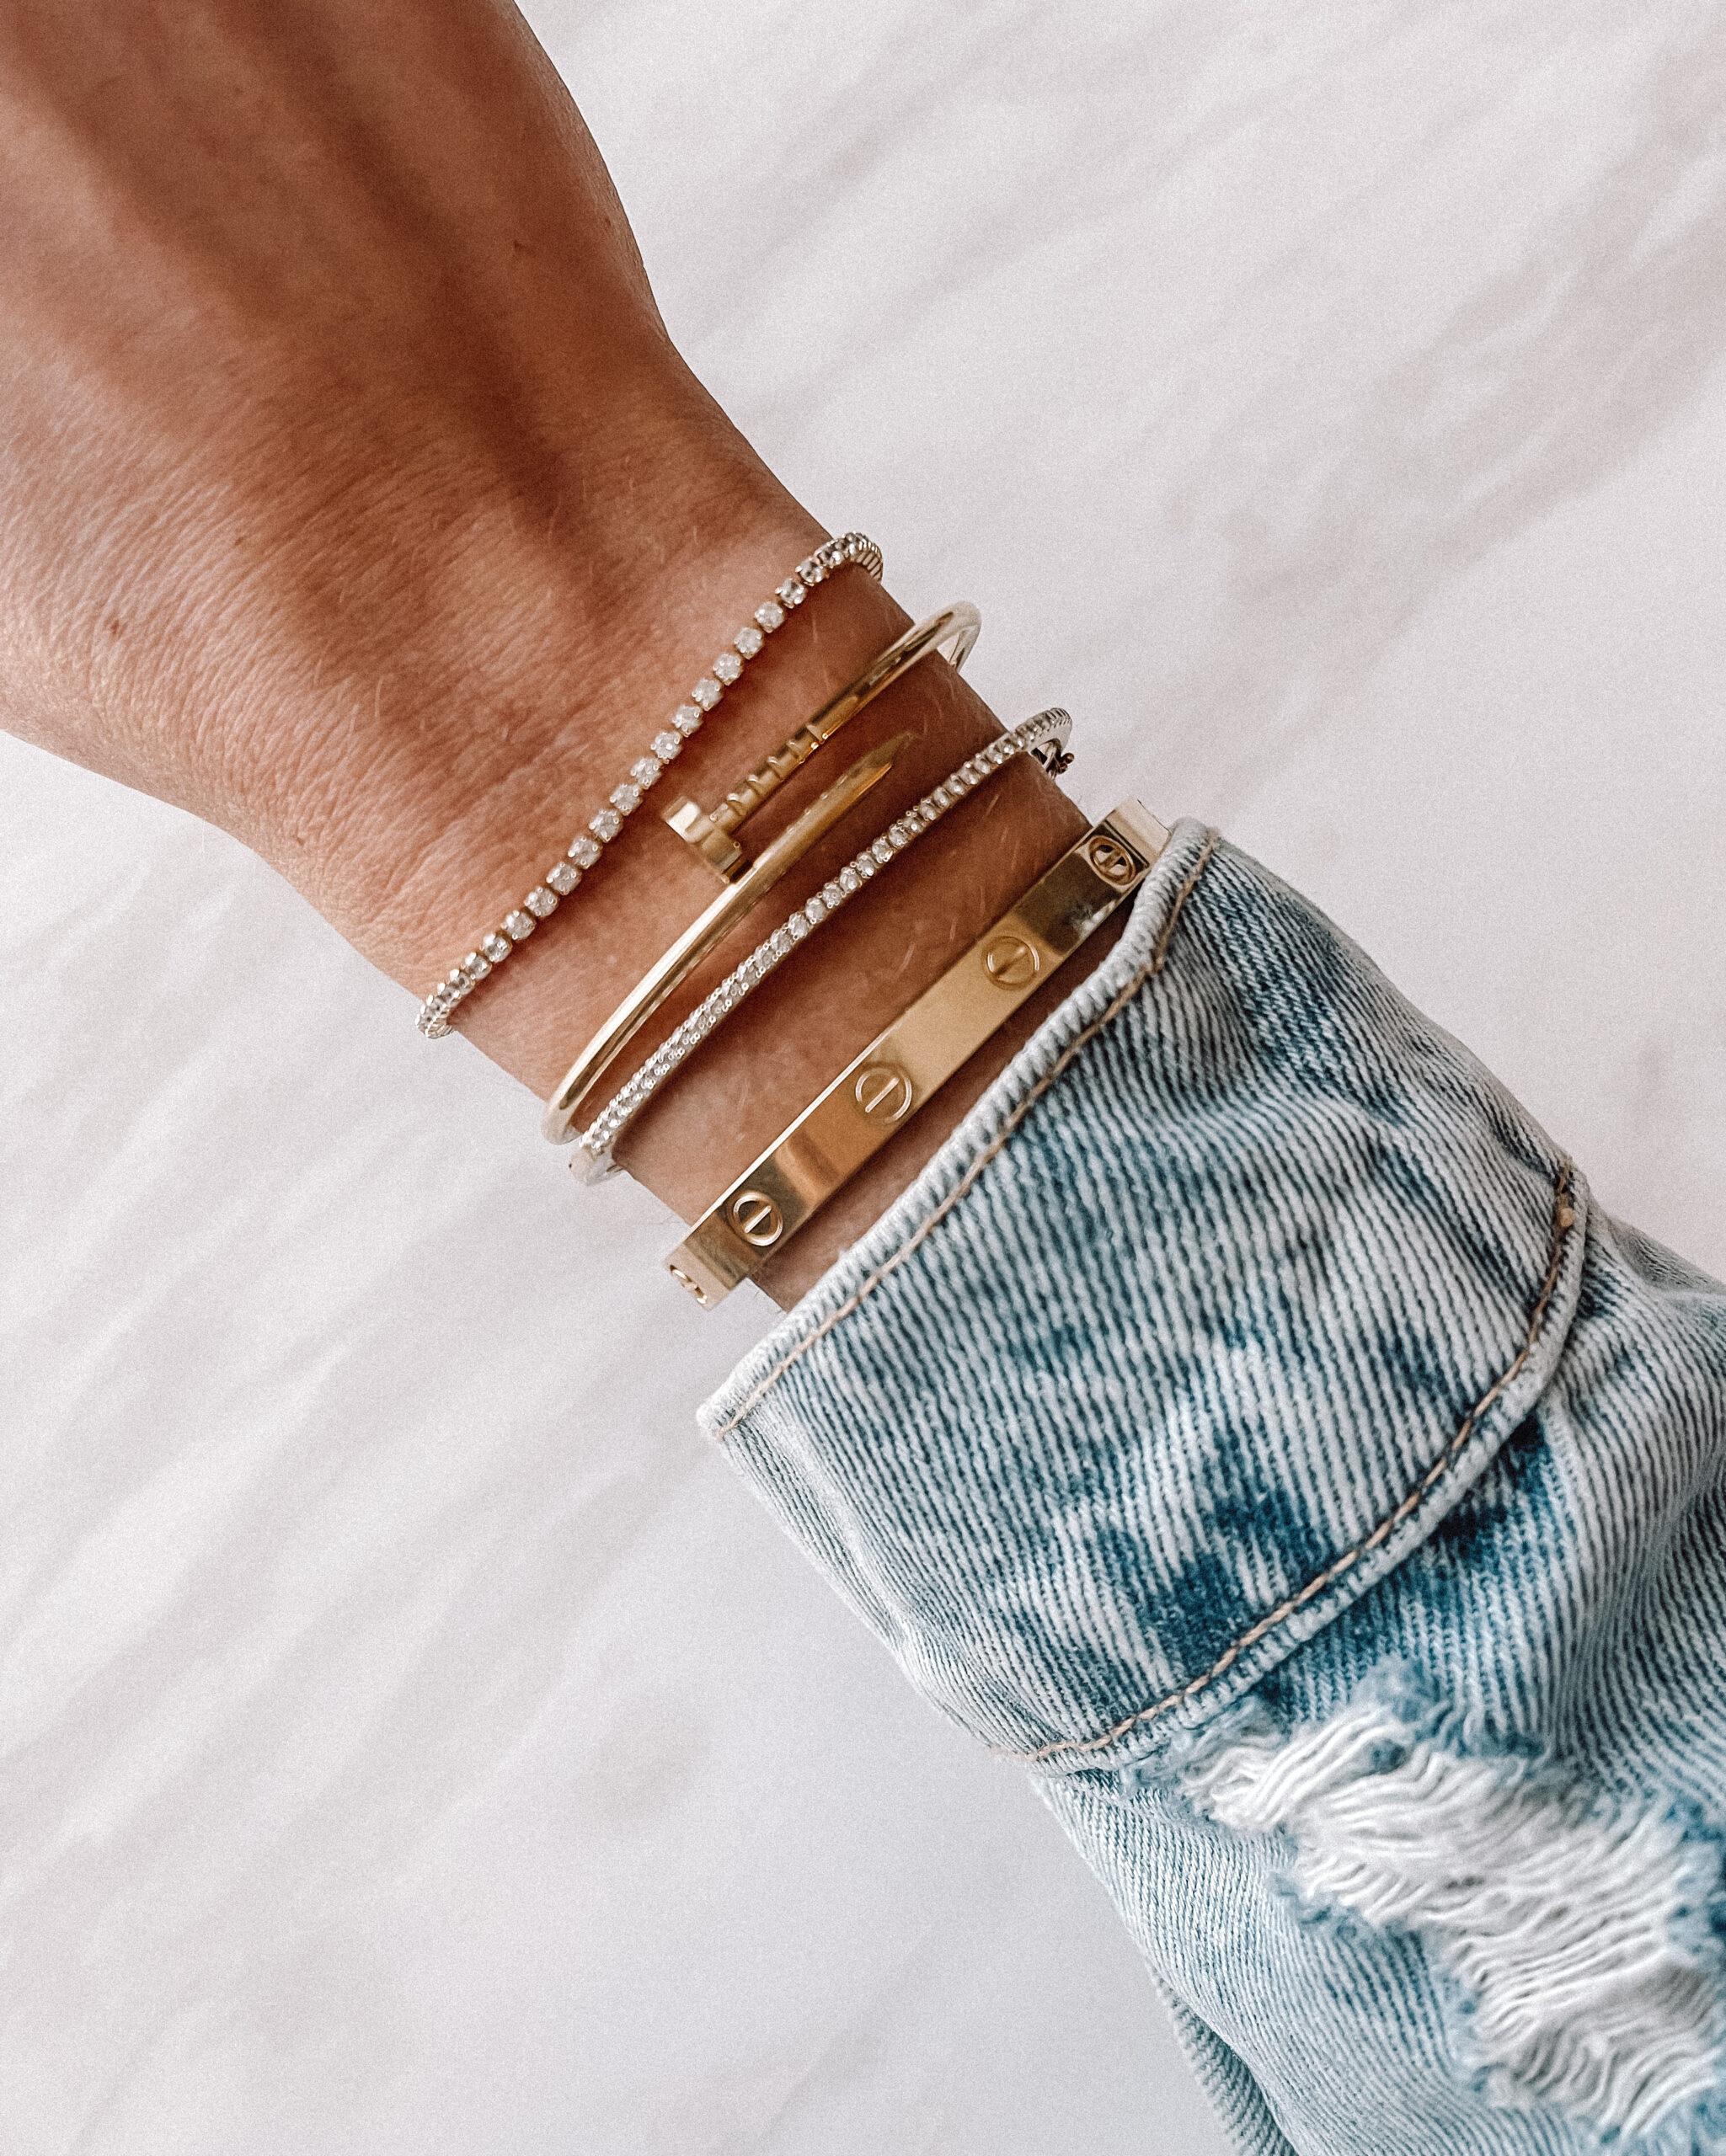 Fashion Jackson Gold Bracelets Amazon Tennis Bracelet Cartier Love Bracelet